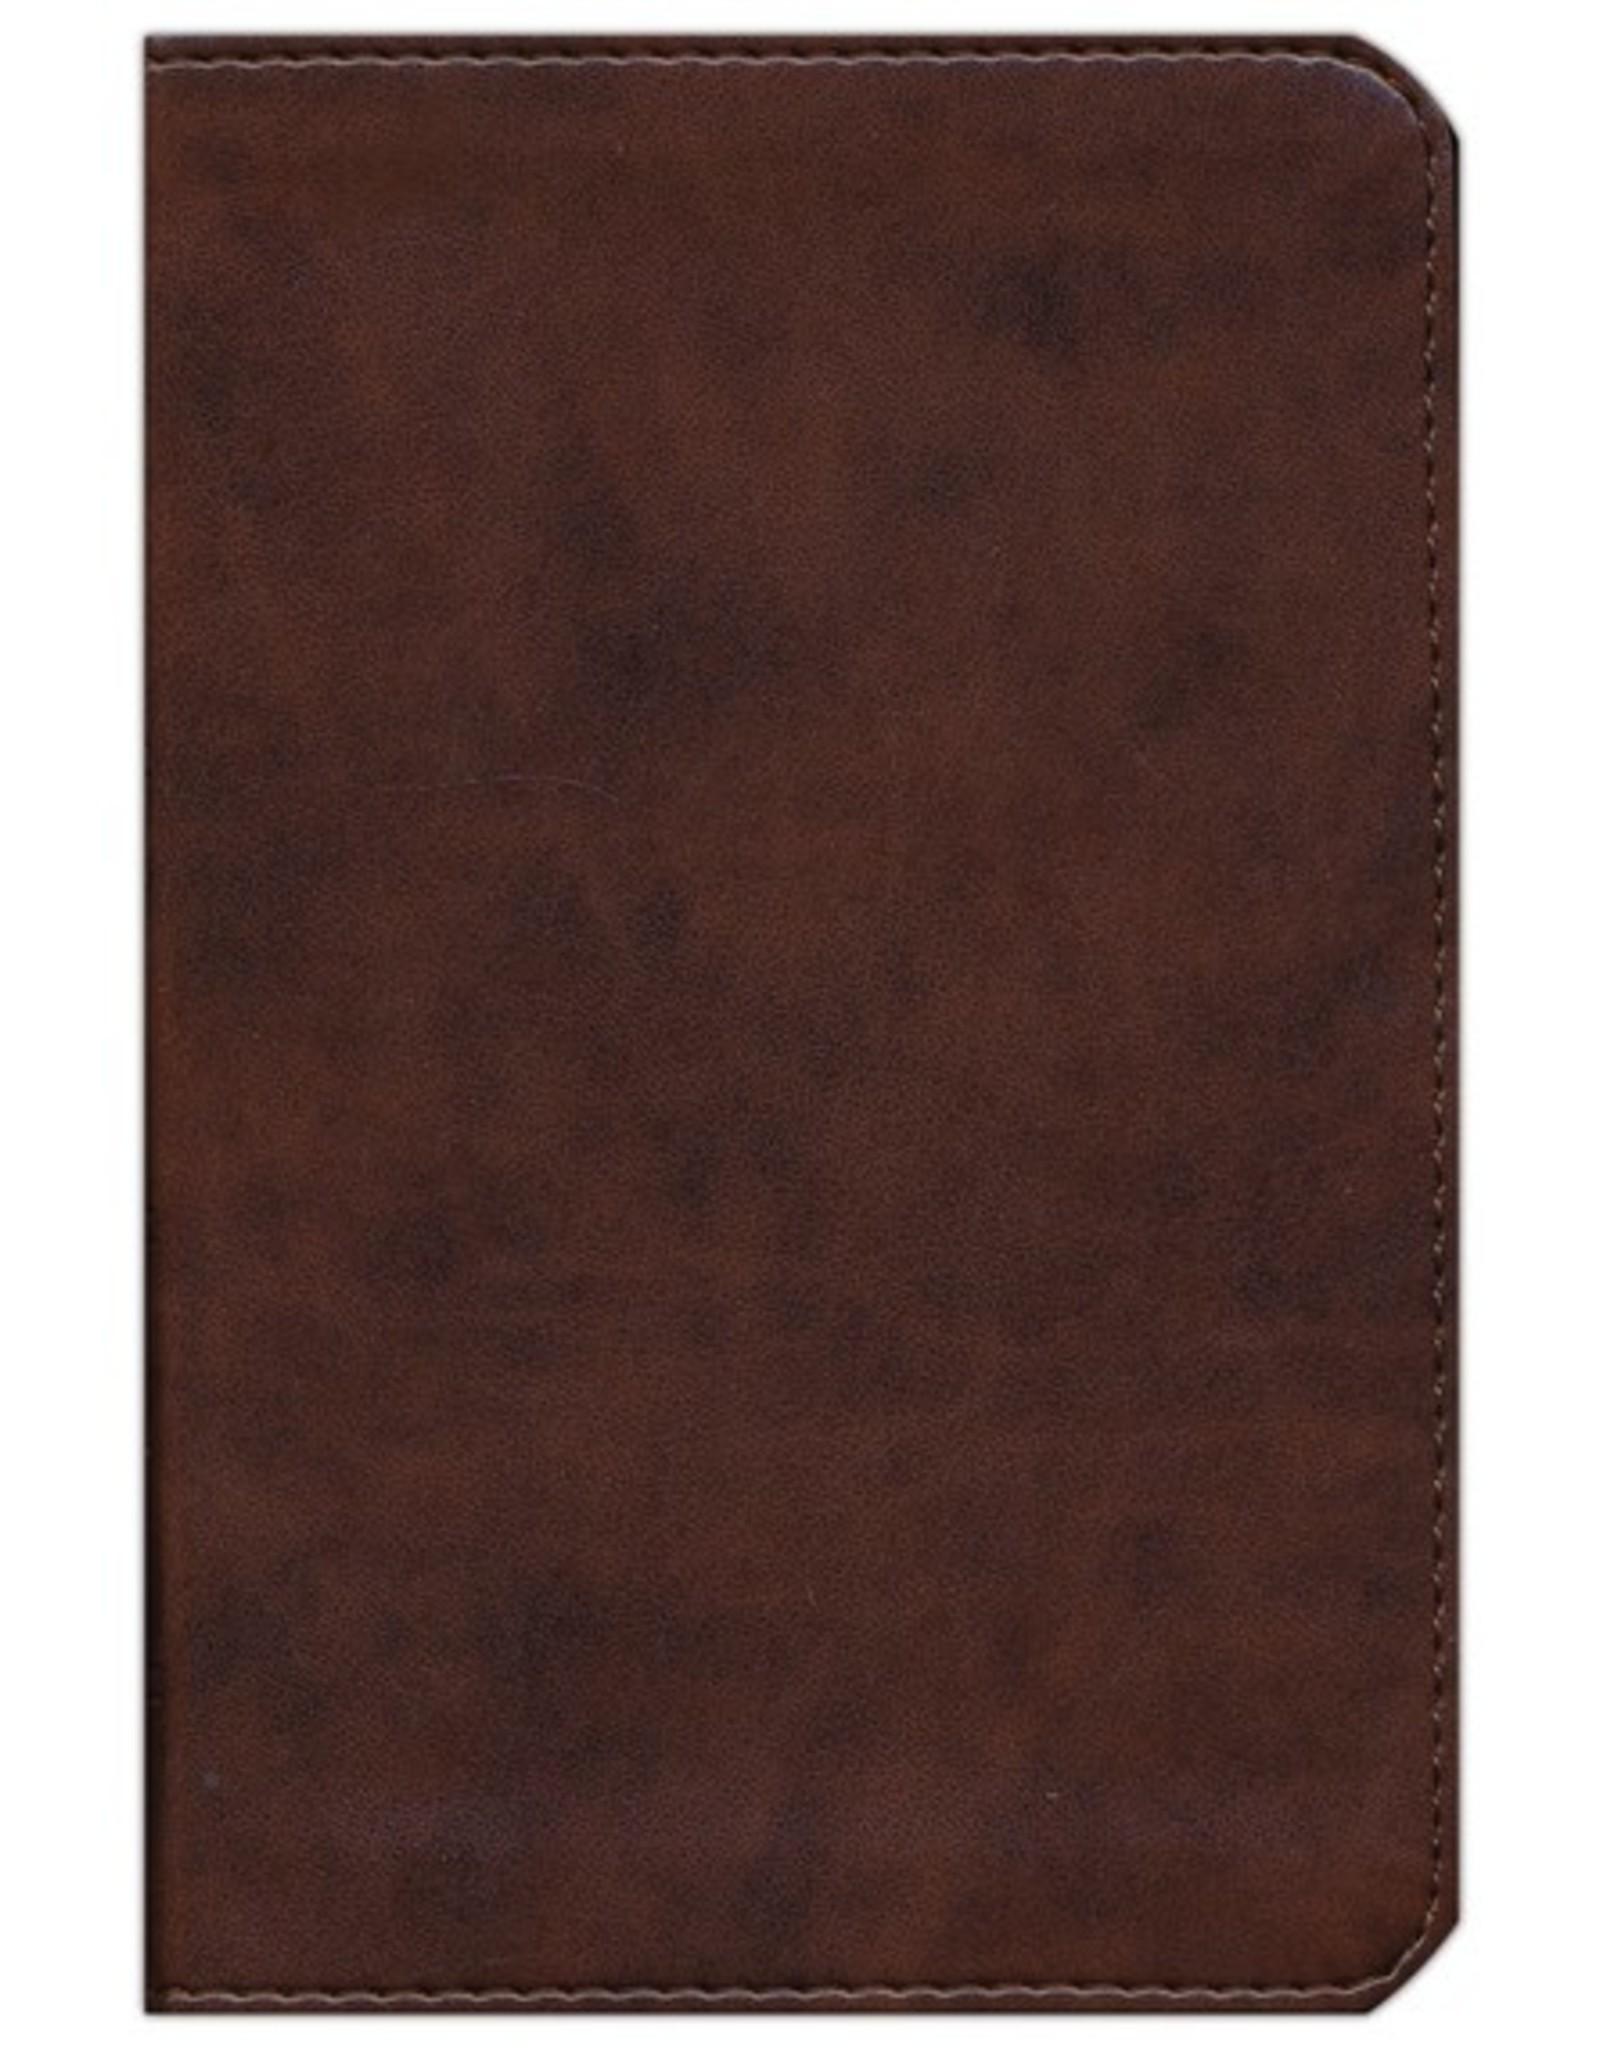 Crossway / Good News ESV Compact Bible (TruTone, Brown)